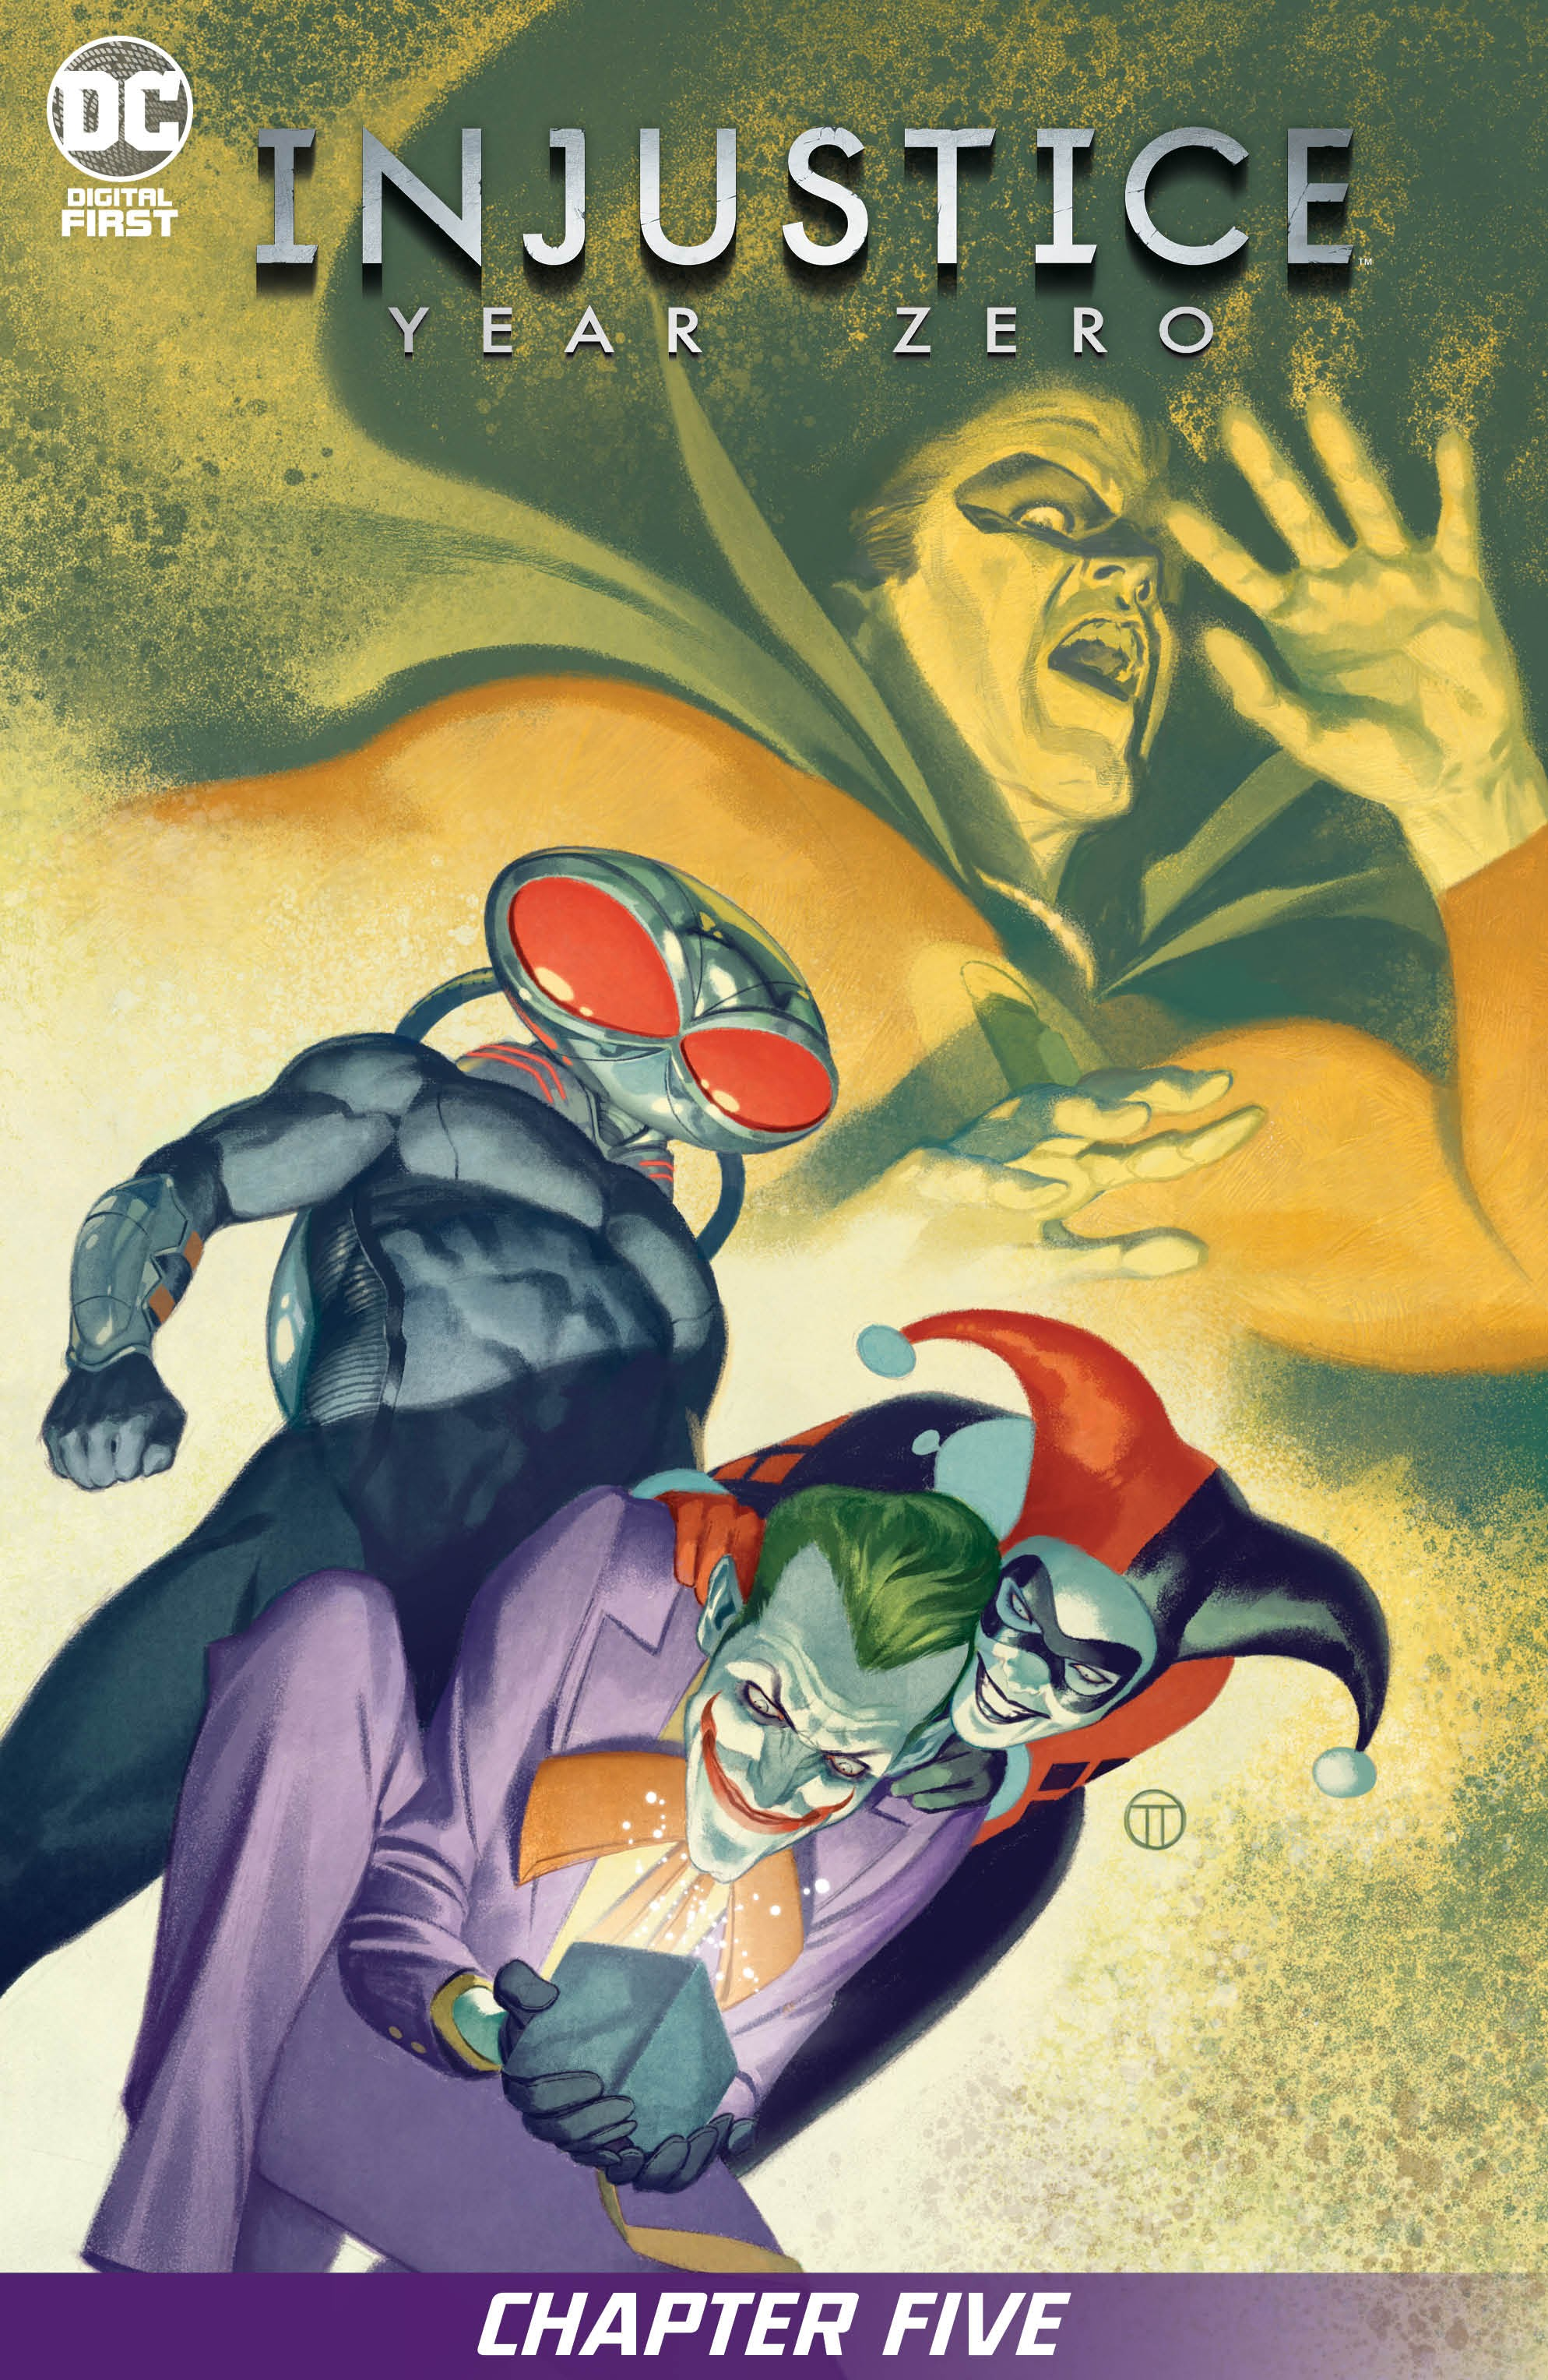 Injustice: Year Zero Vol 1 5 (Digital)